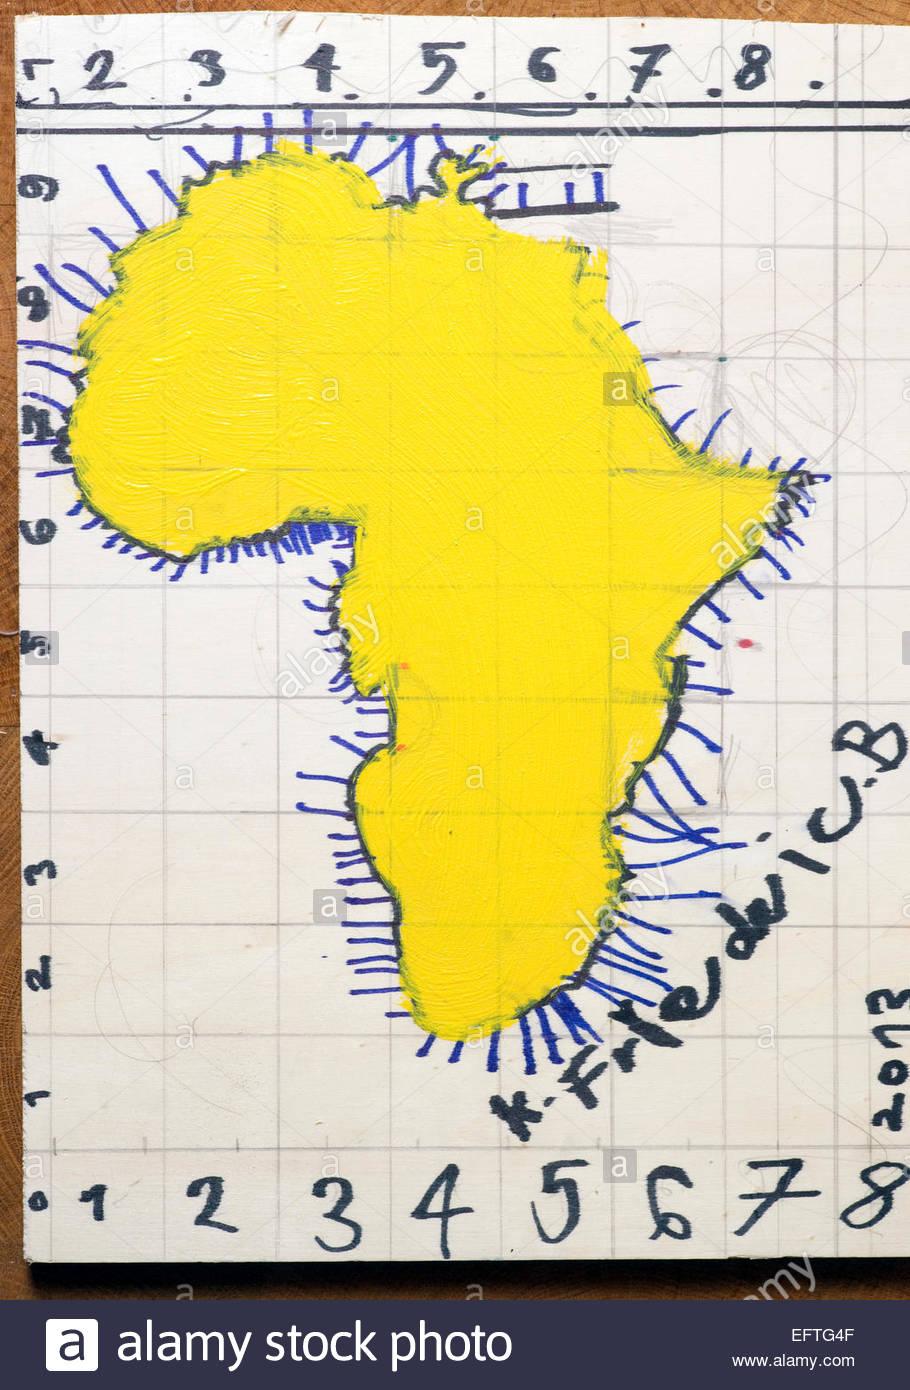 Kid Map Of Africa.Artwork Artist Painting Art Creativity Painting Map Of Africa Childs